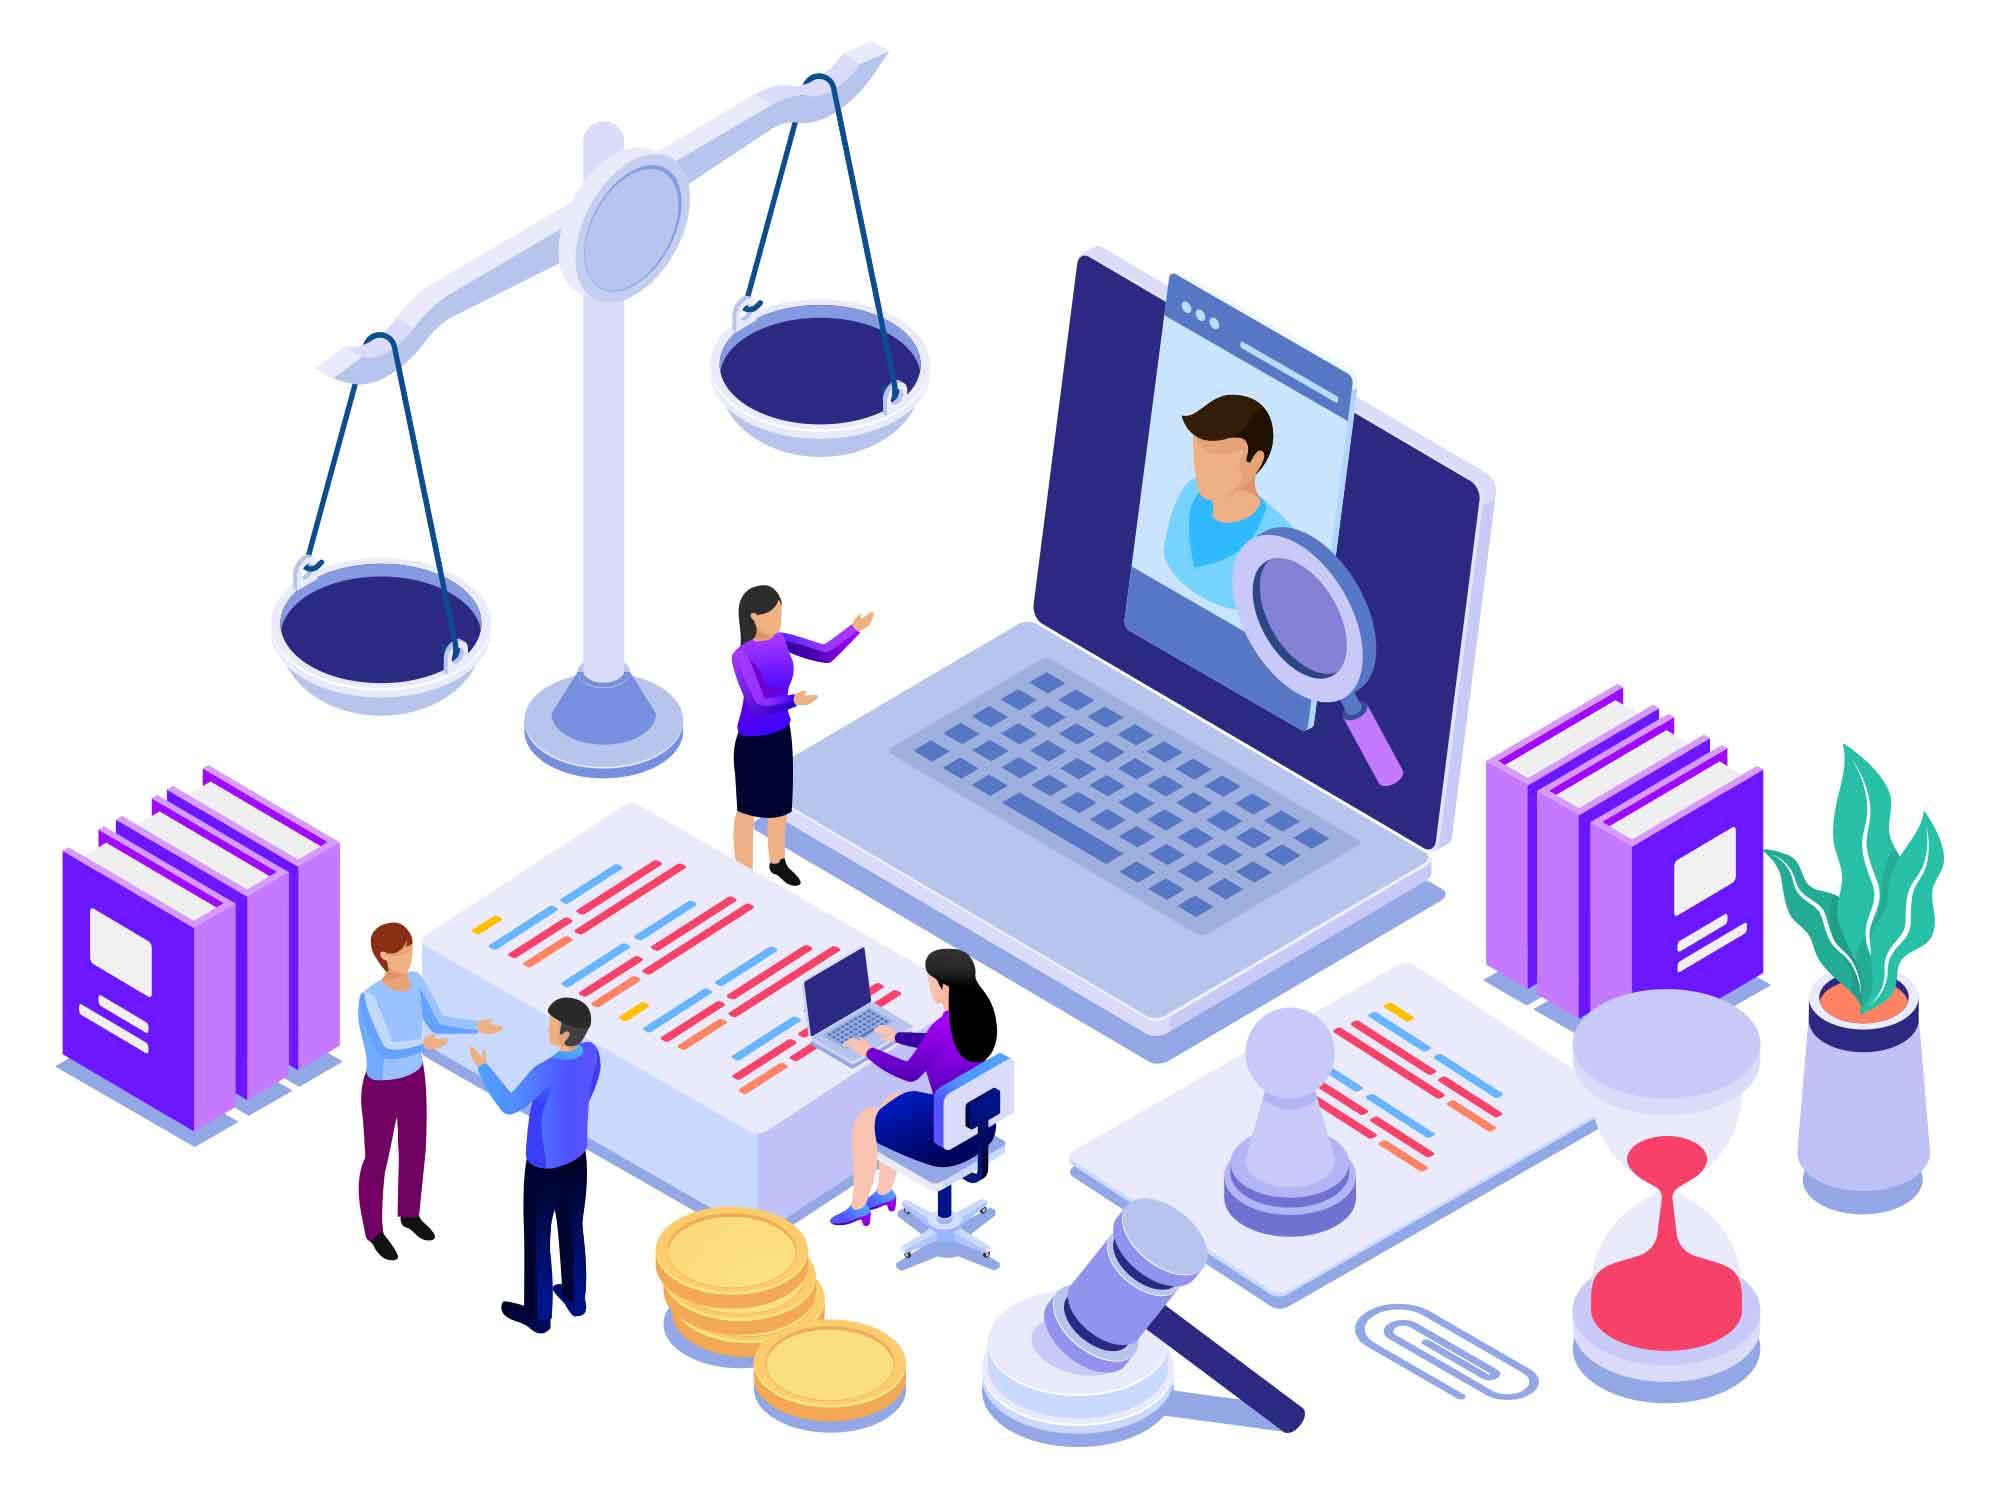 Legal Advice Vector Illustration